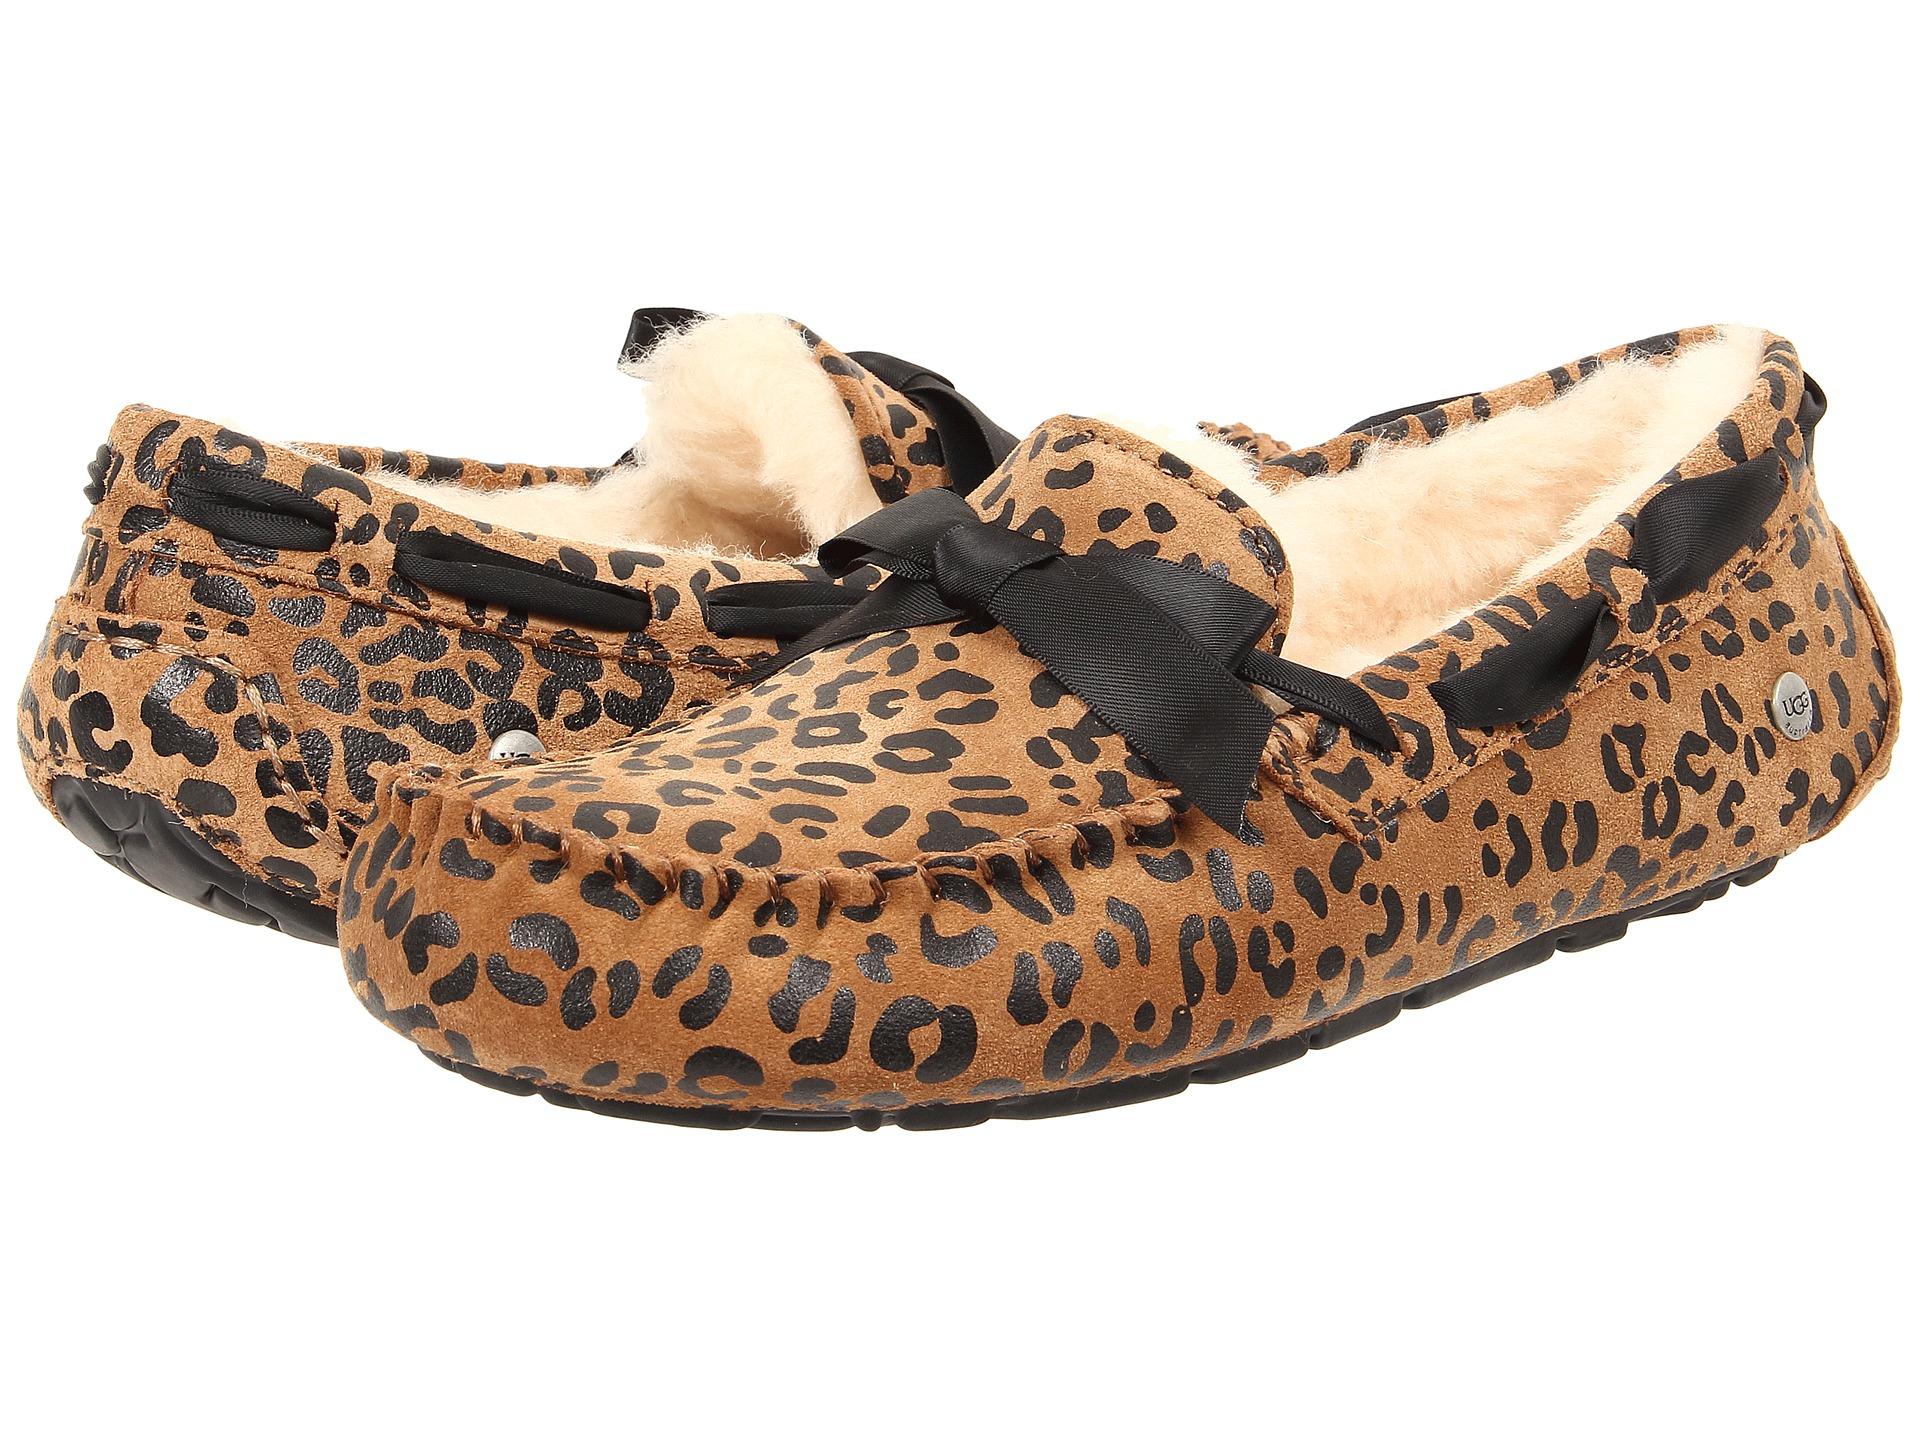 54054c34173 UGG Brown Dakota Leopard Bow